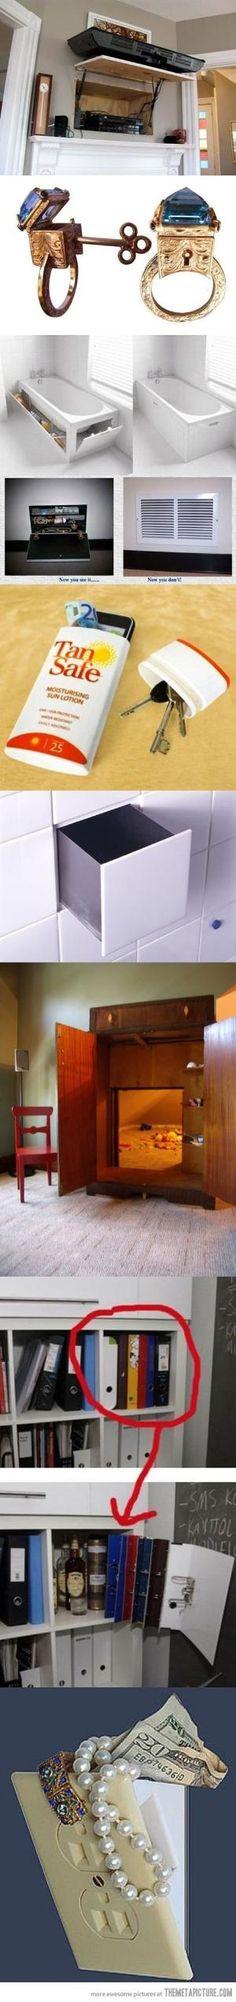 Clever hiding spots by laramysue